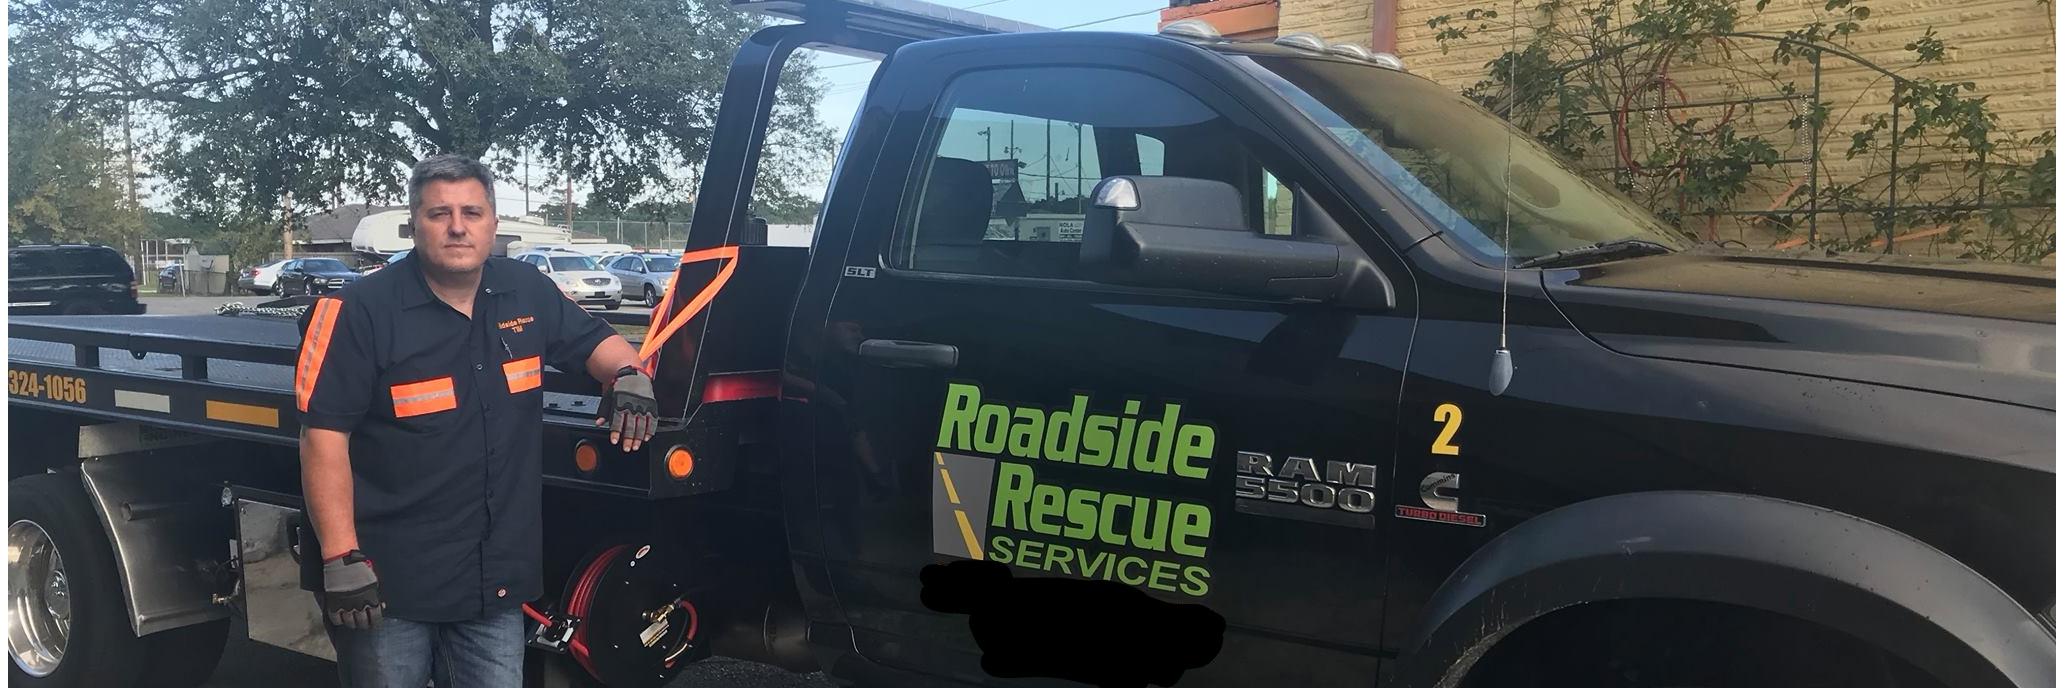 ROADSIDE RESCUE SERVICES LLC Towing.com Profile Banner